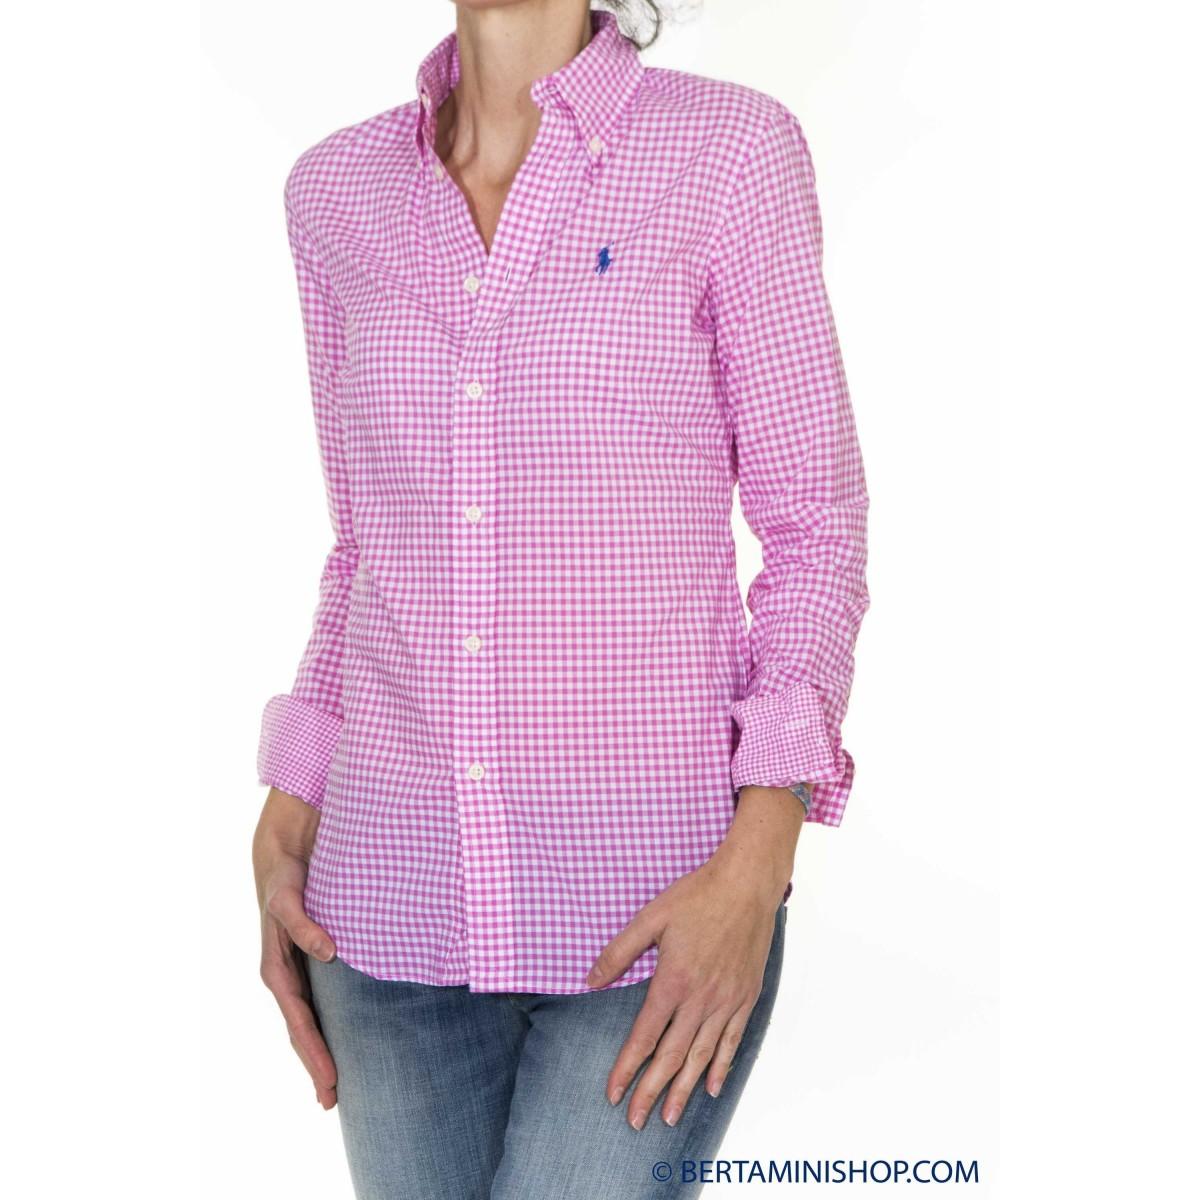 Camicia Donna Ralph Lauren - V33Ih739Vh739 Cam Quadro J6H01 - Fuxia